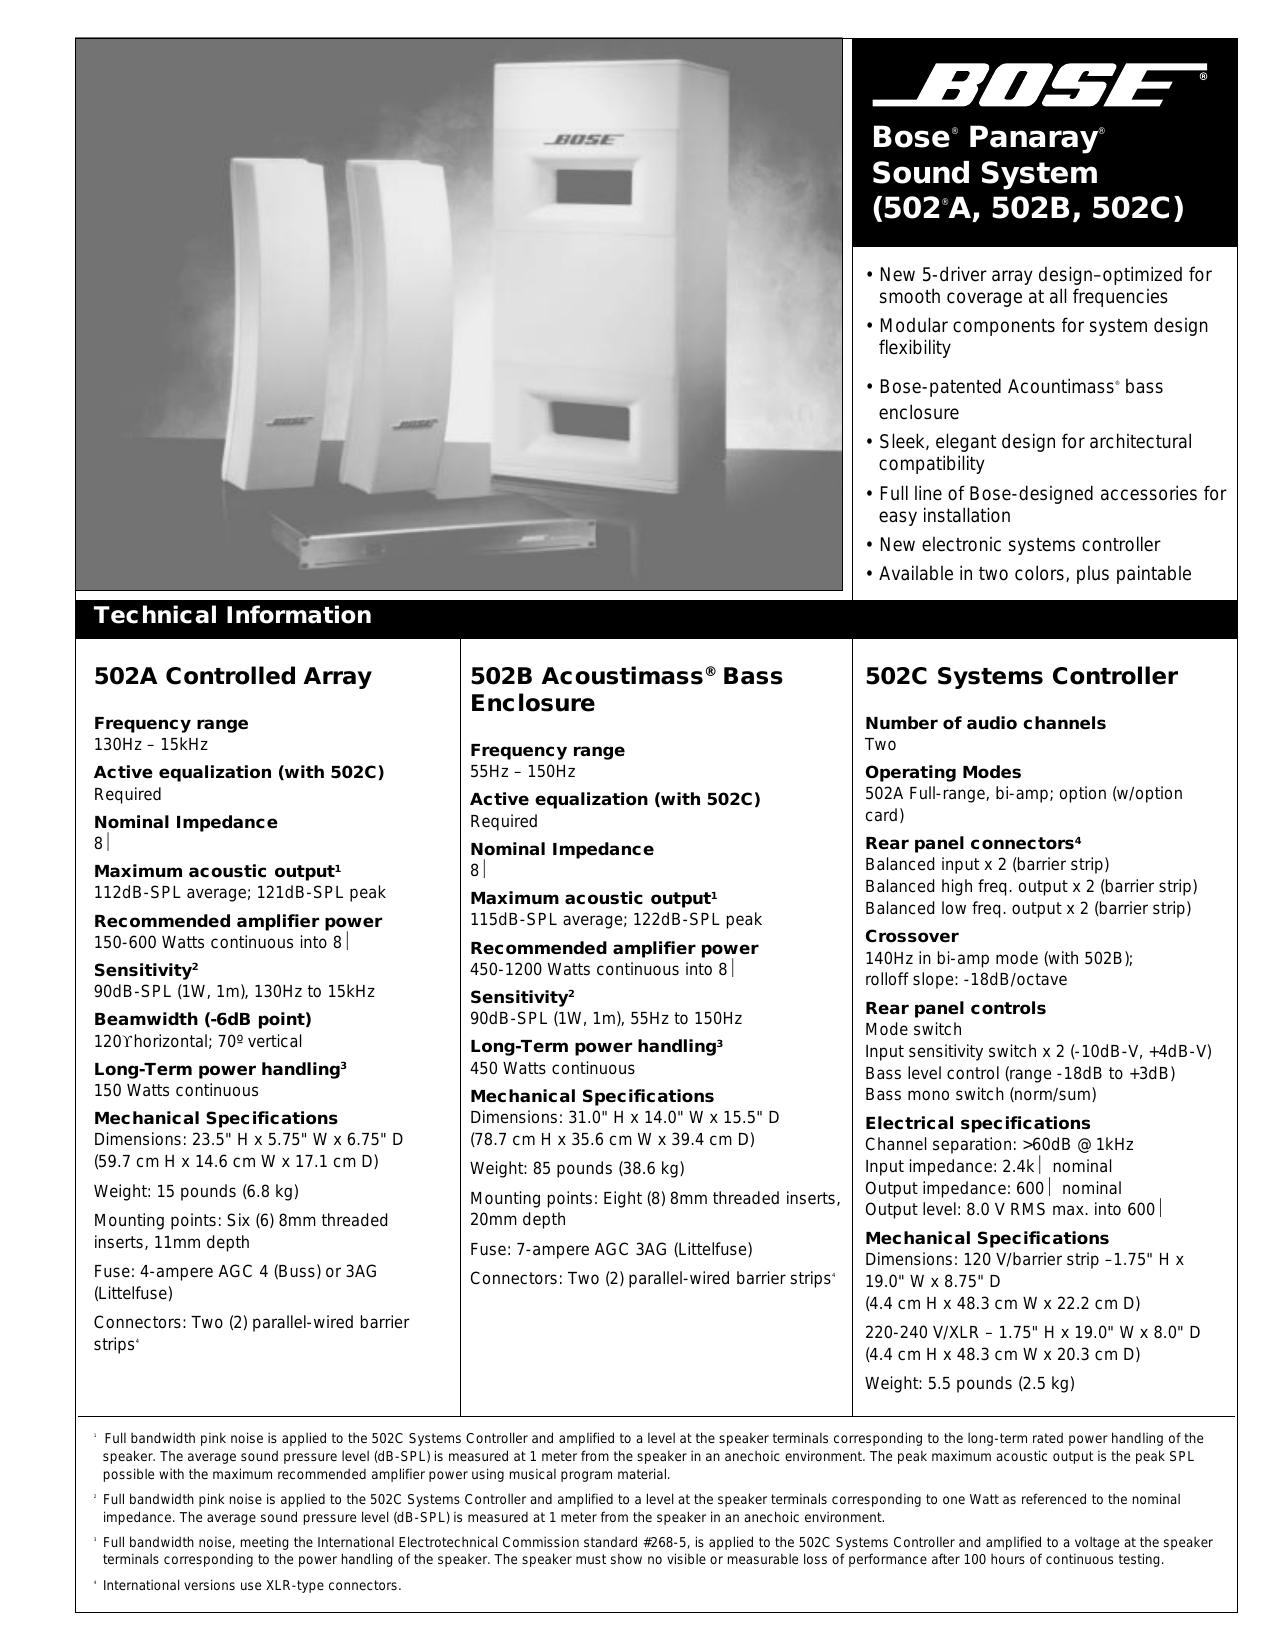 bose 502c system controller manual